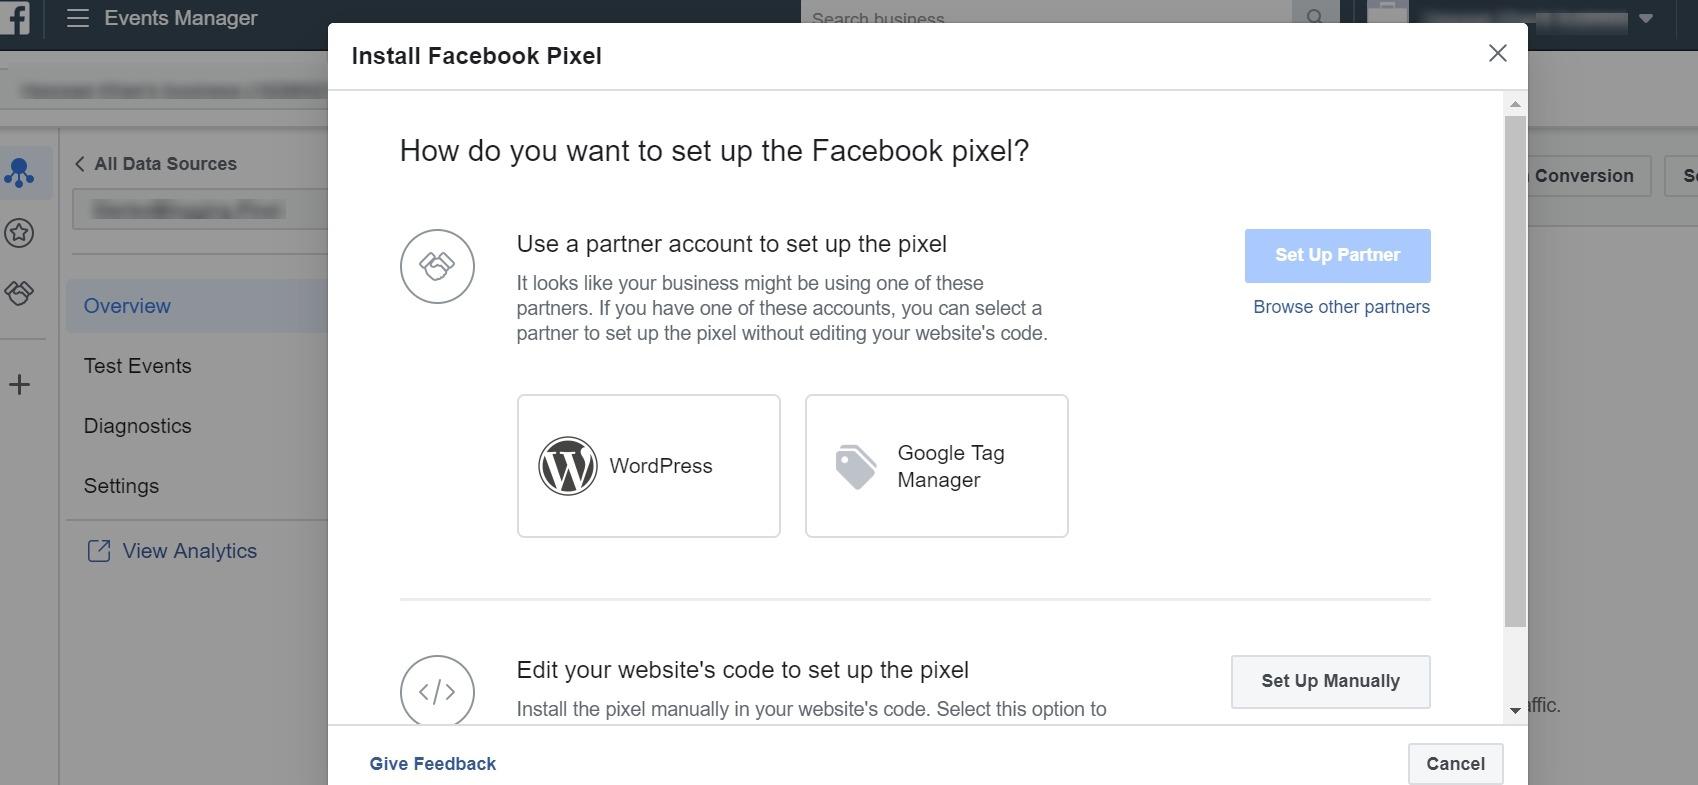 install-facebook-pixel